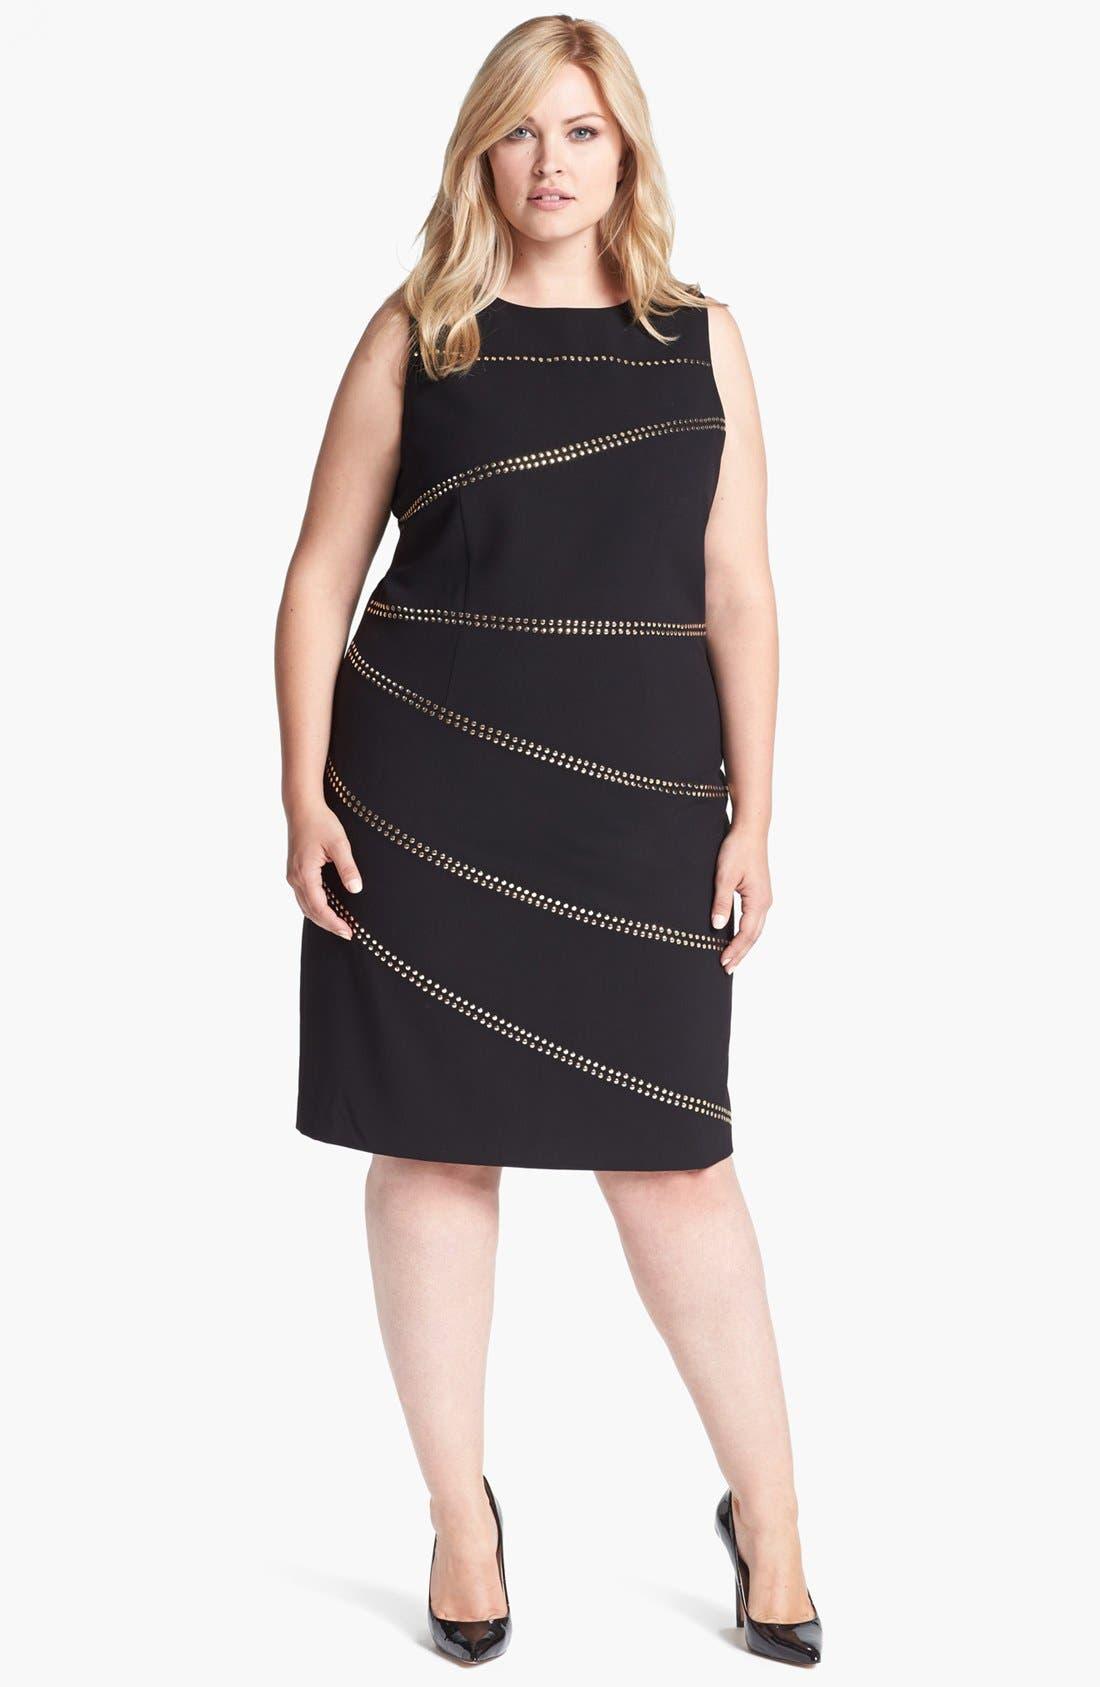 Alternate Image 1 Selected - Calvin Klein Studded Sheath Dress (Plus Size)